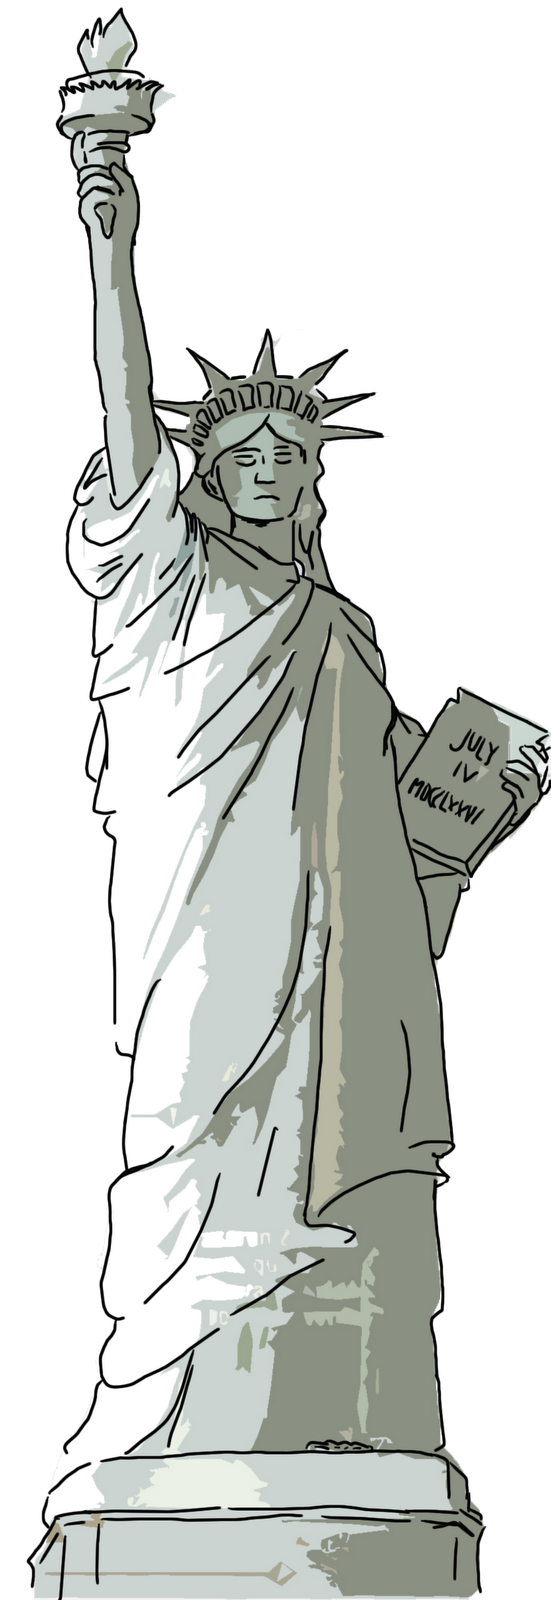 Caballeros molinienses la se ora libertad for Interior estatua de la libertad